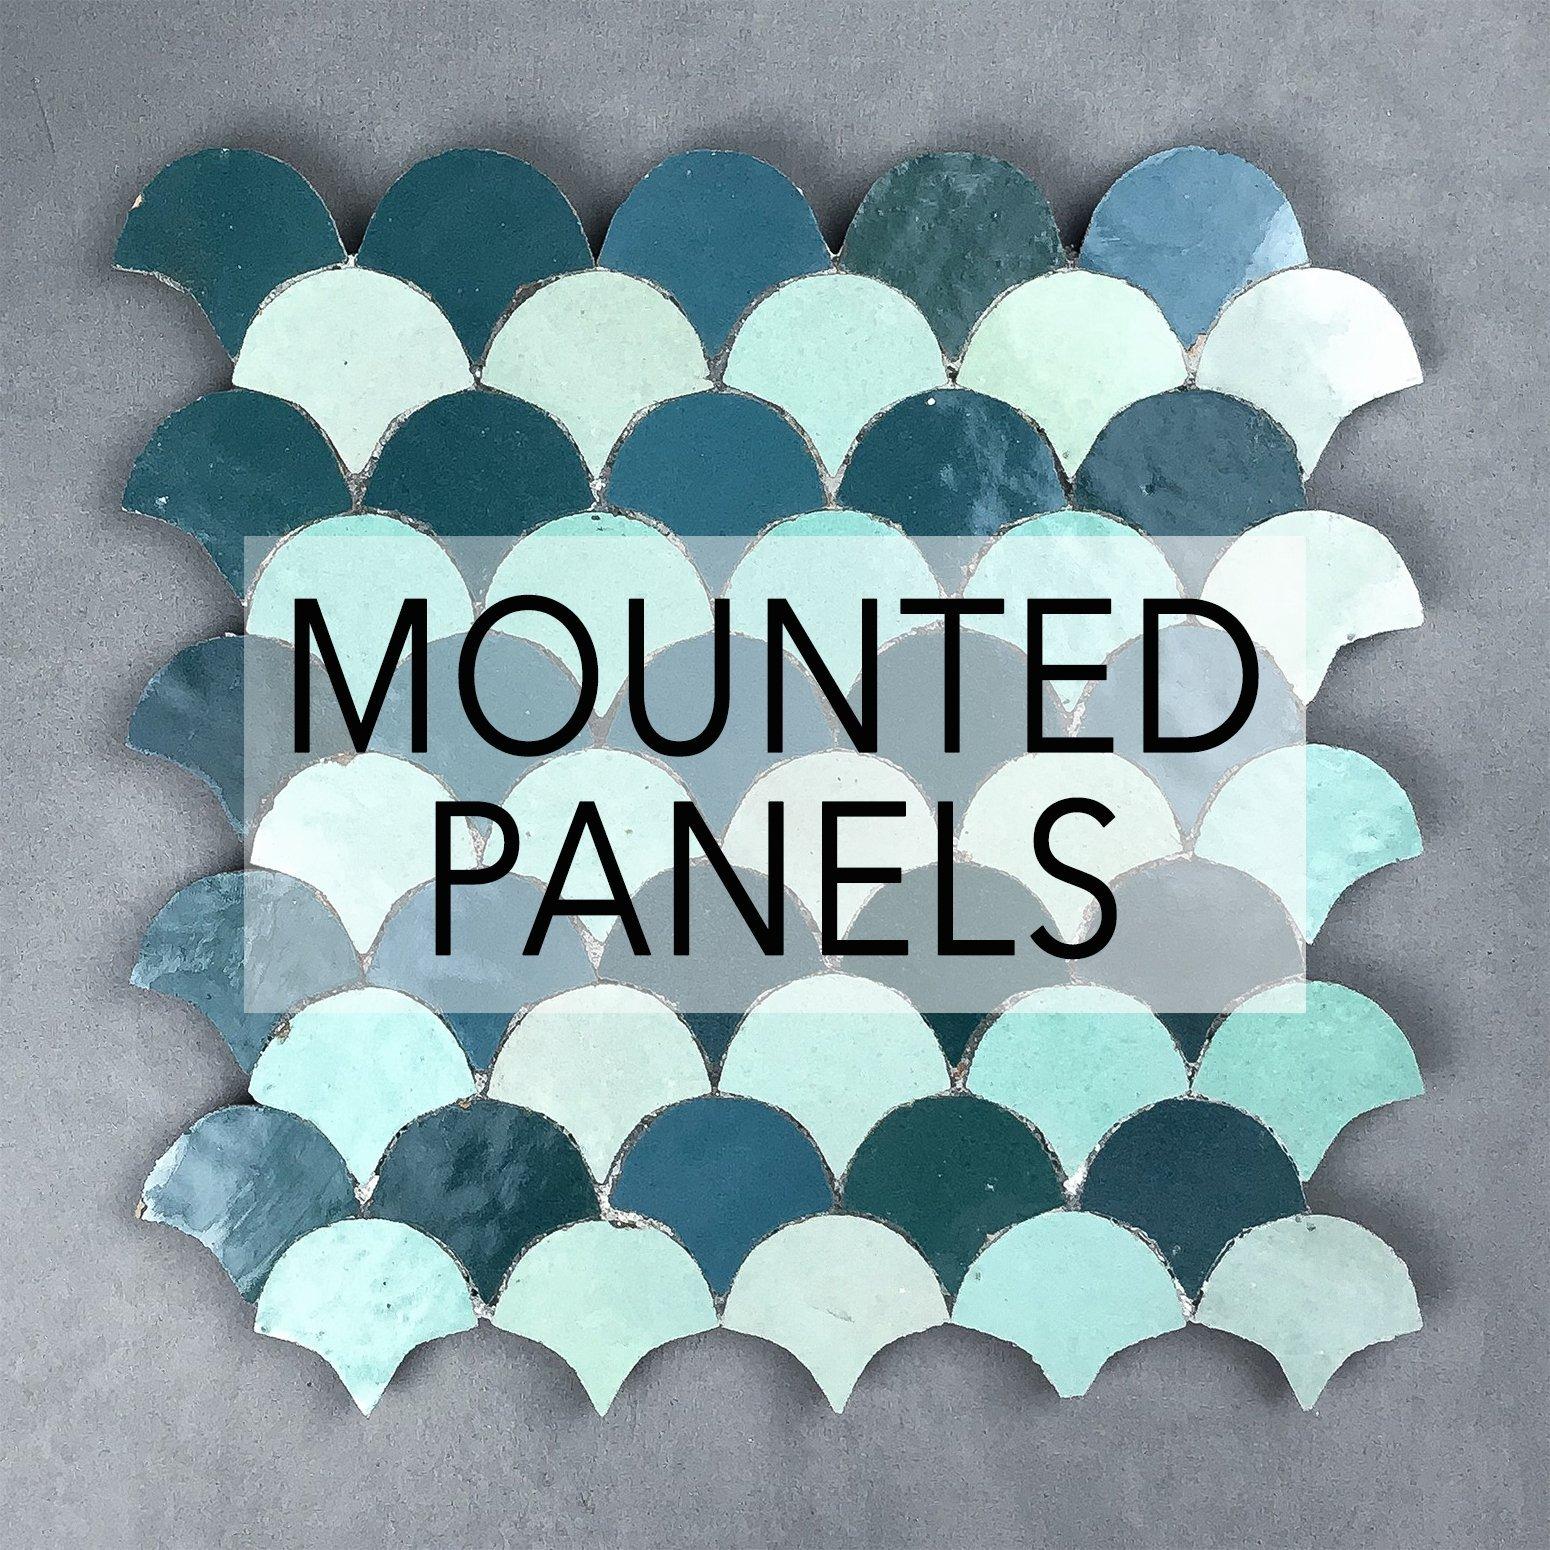 Mounted Panels